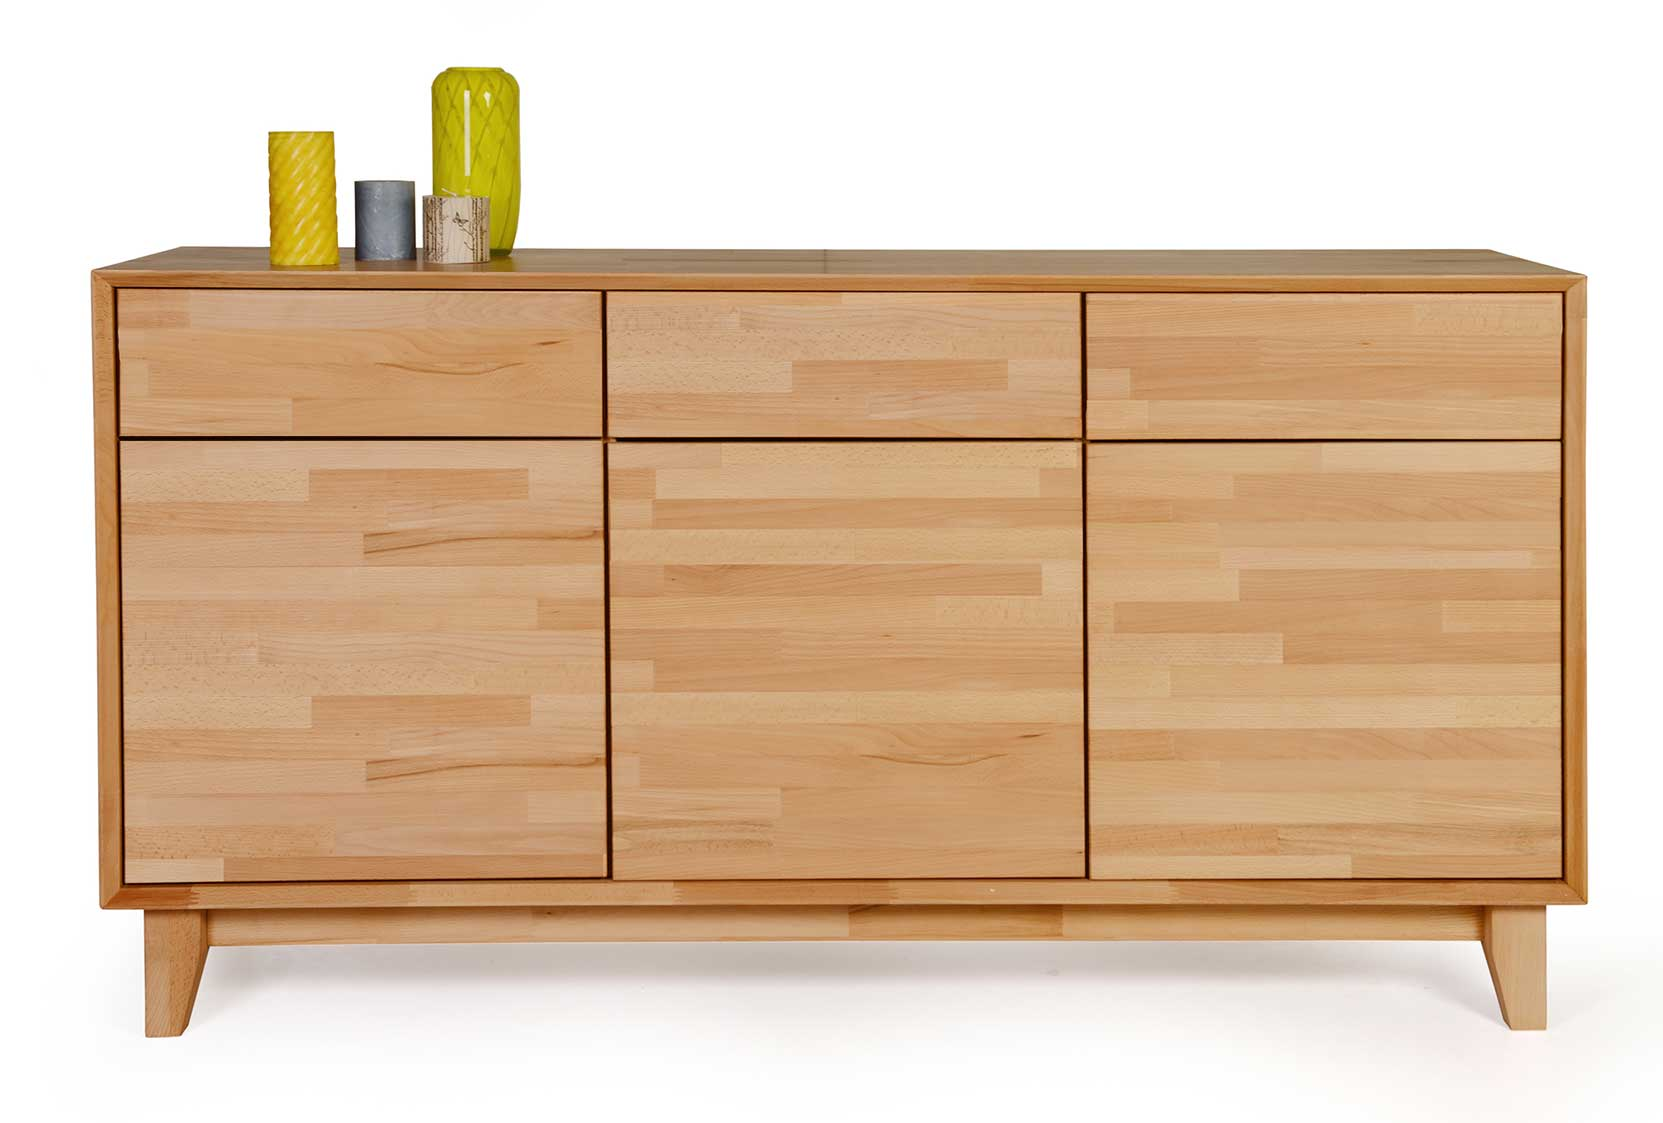 Standard Furniture Numero Uno Sideboard massiv kernbuche